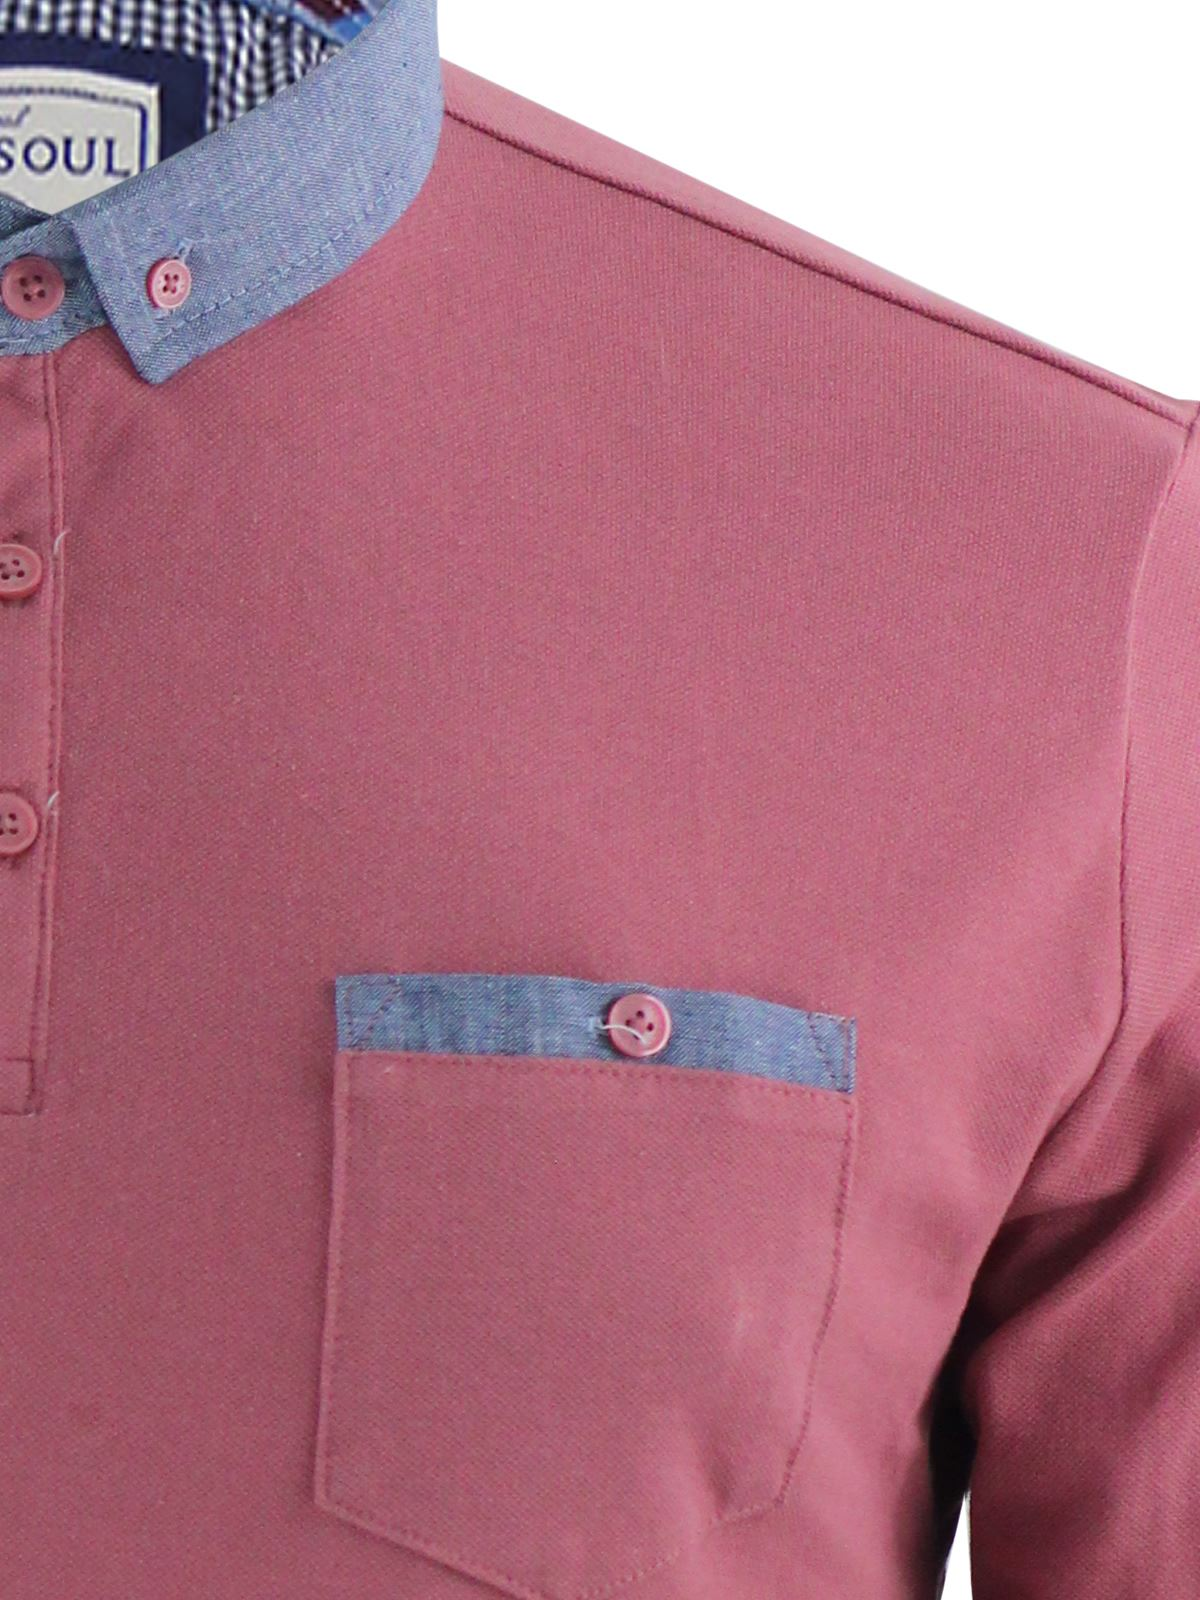 thumbnail 13 - Mens-Polo-T-Shirt-Brave-Soul-Hera-Cotton-Long-Sleeve-Casual-Top